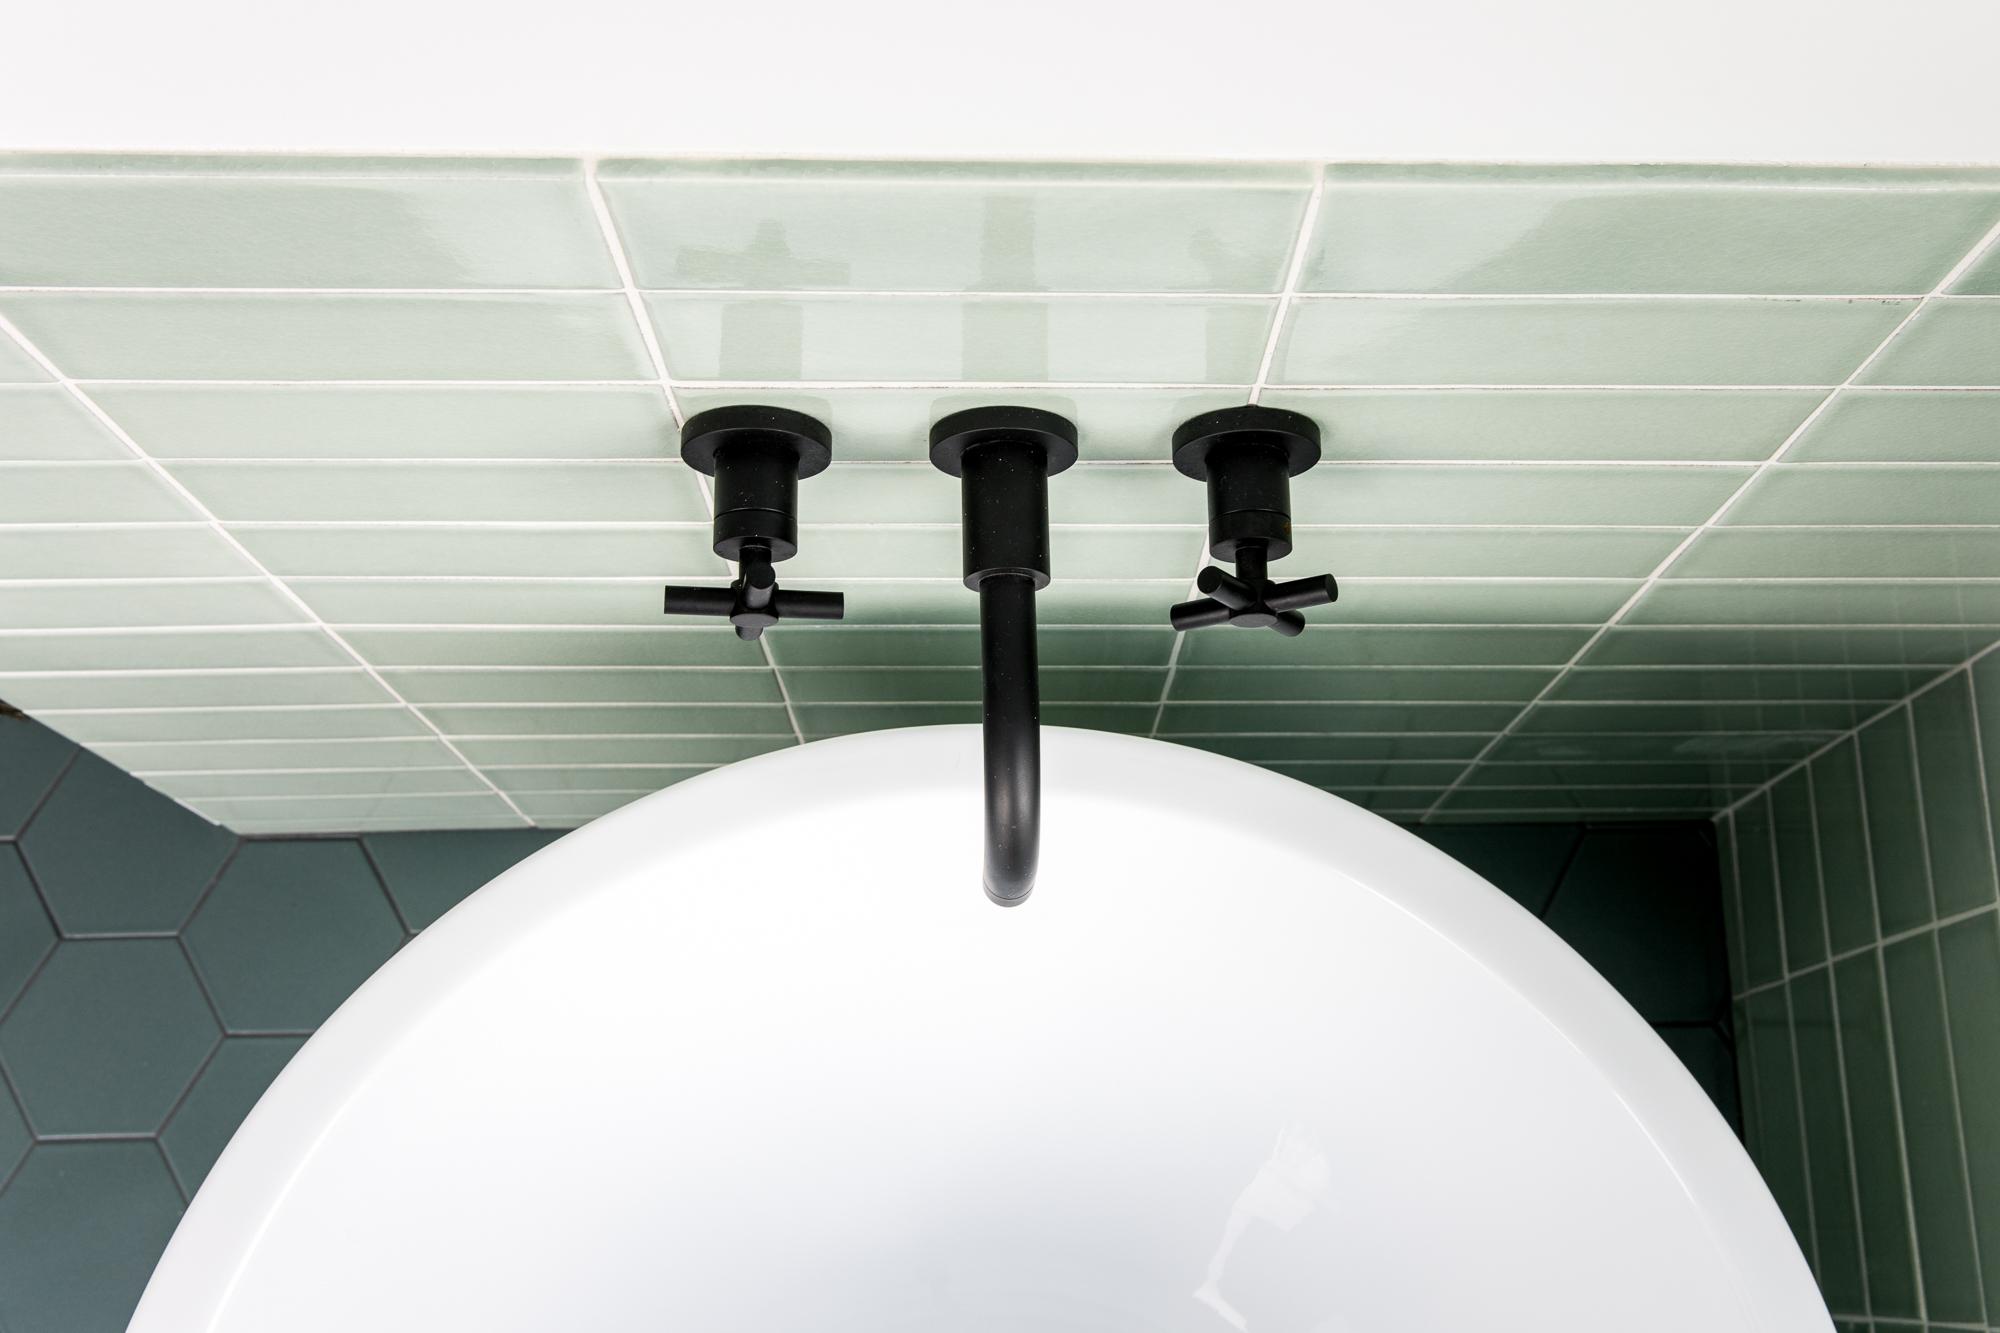 2018_Q1_image_residential_influencer_Fresh_Exchange_master_bathroom_tile_wall_salton_sea_3x9_straight_set_tub_surround_wainscot_glazed_edge_long_detail.jpg?mtime=20180610101837#asset:265432